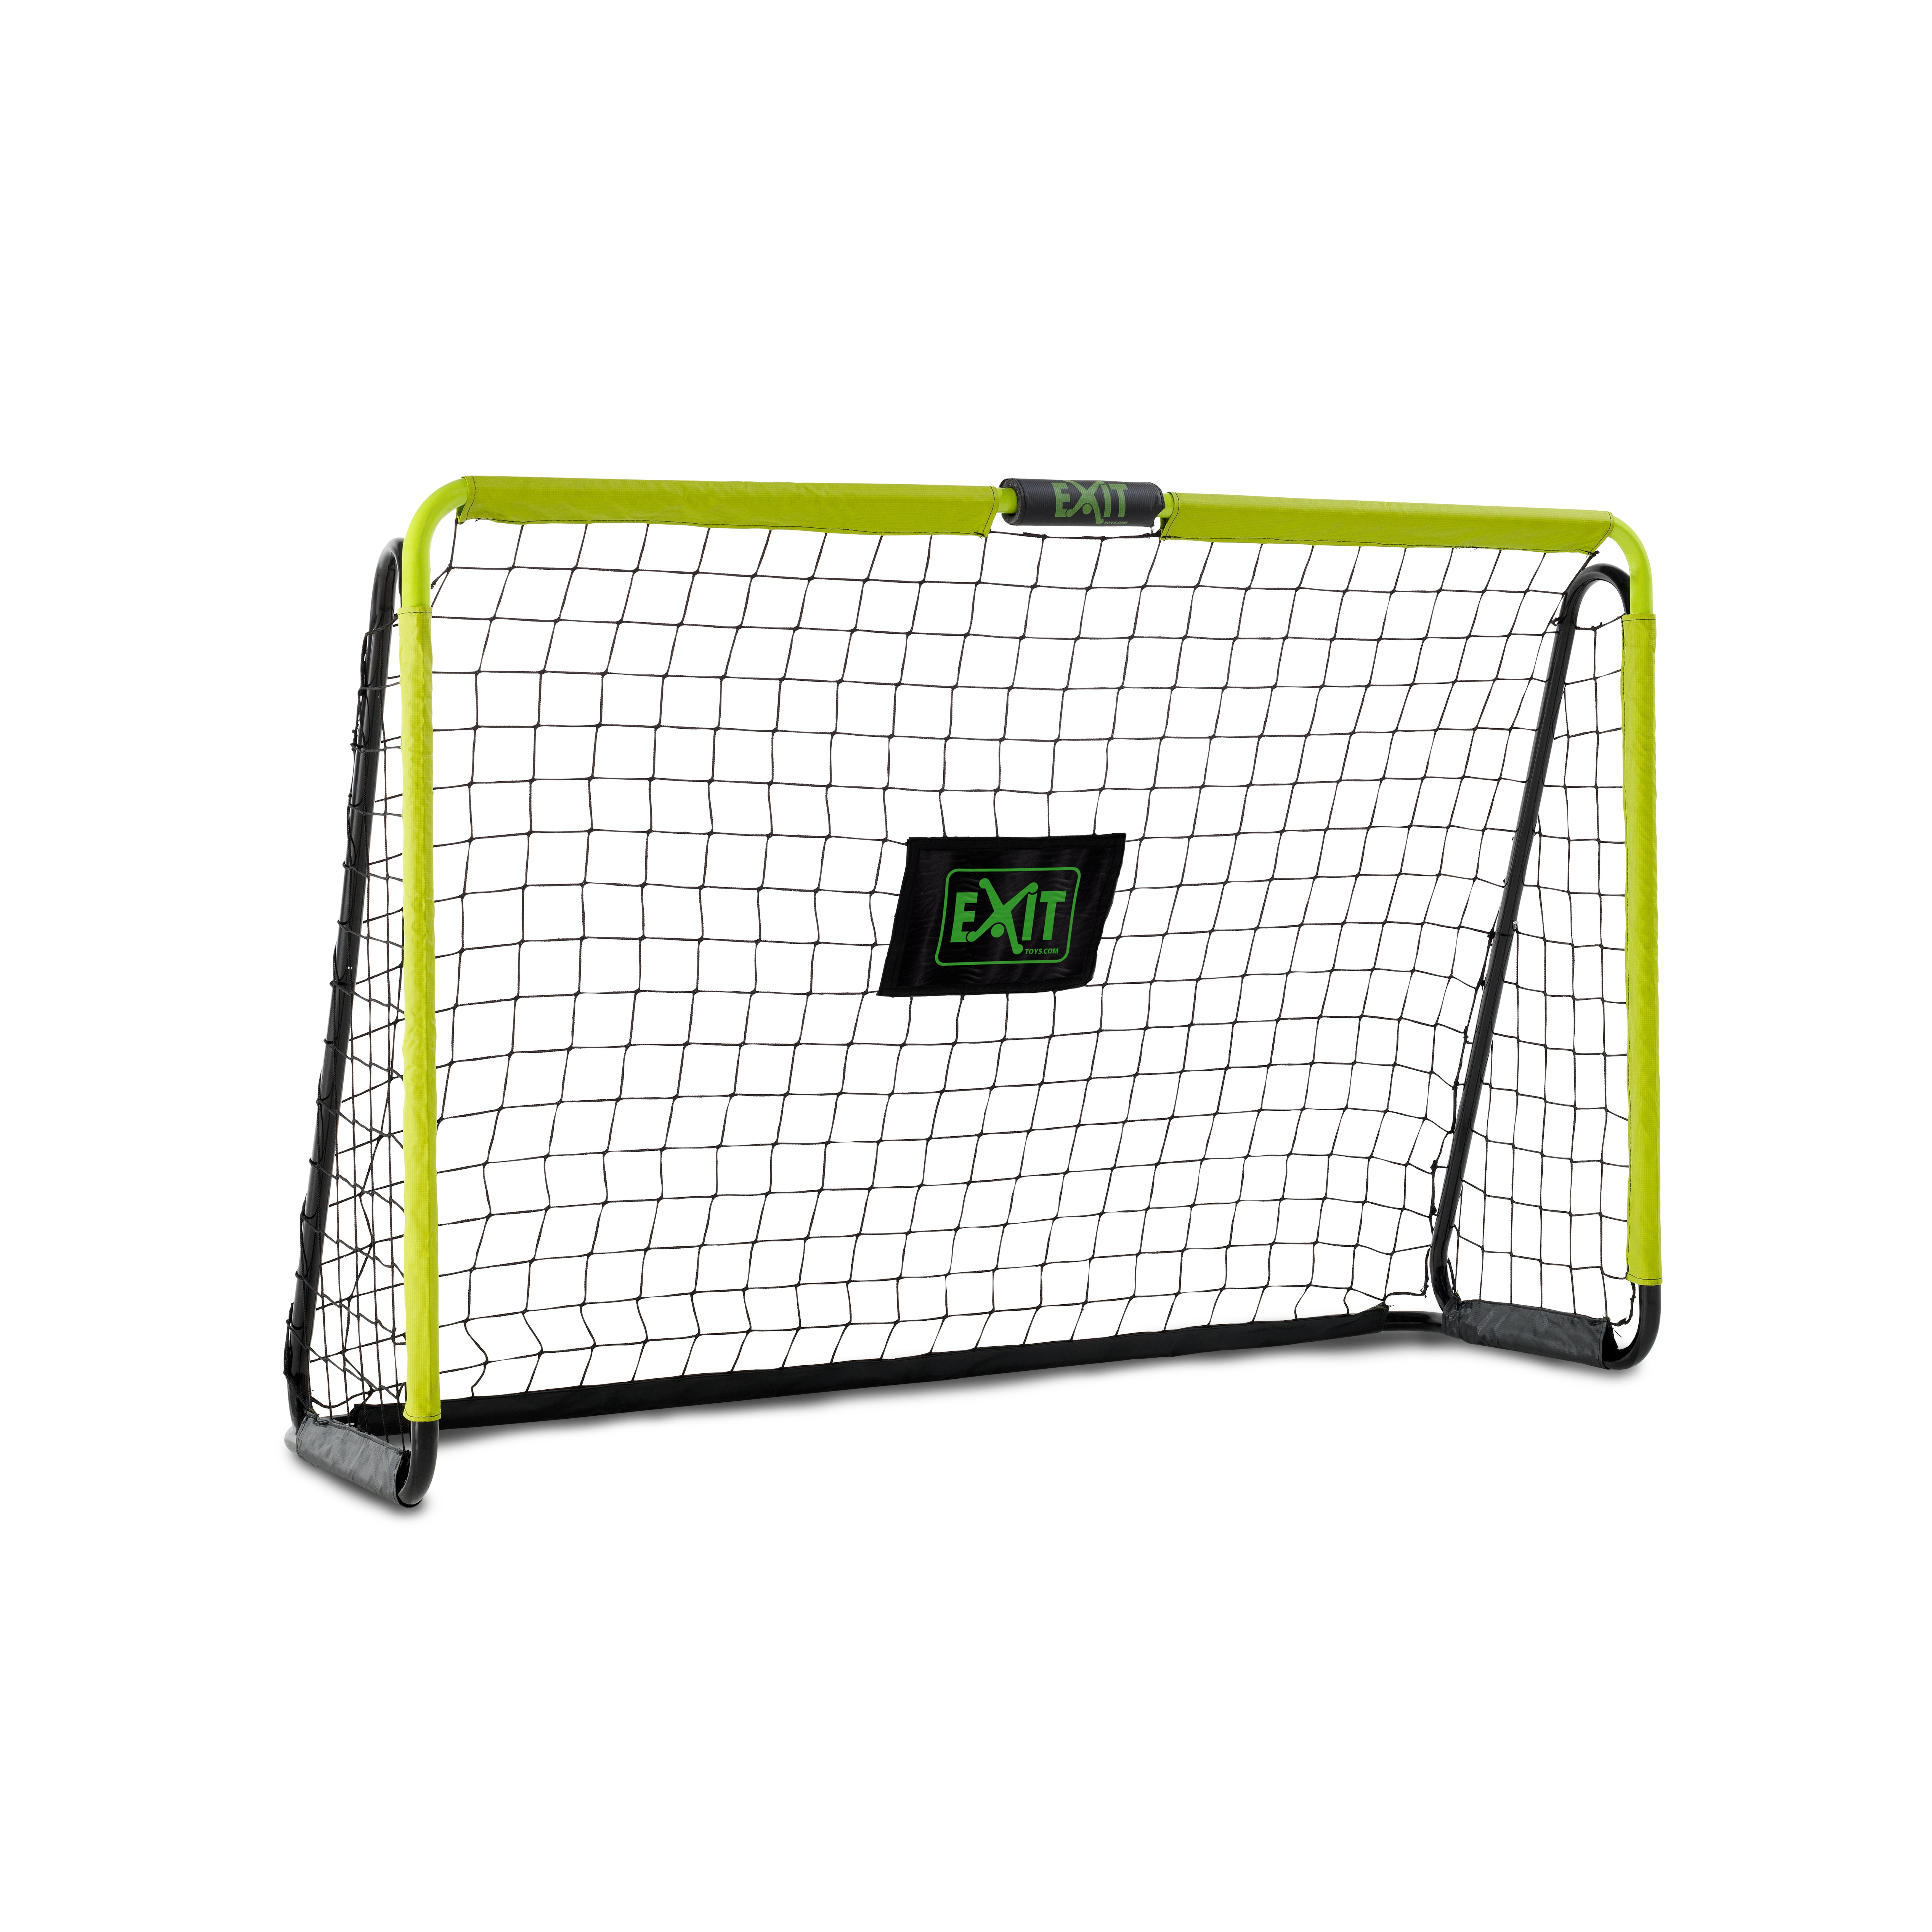 EXIT - Tempo 1800 Soccer Goal (41.20.18.00)